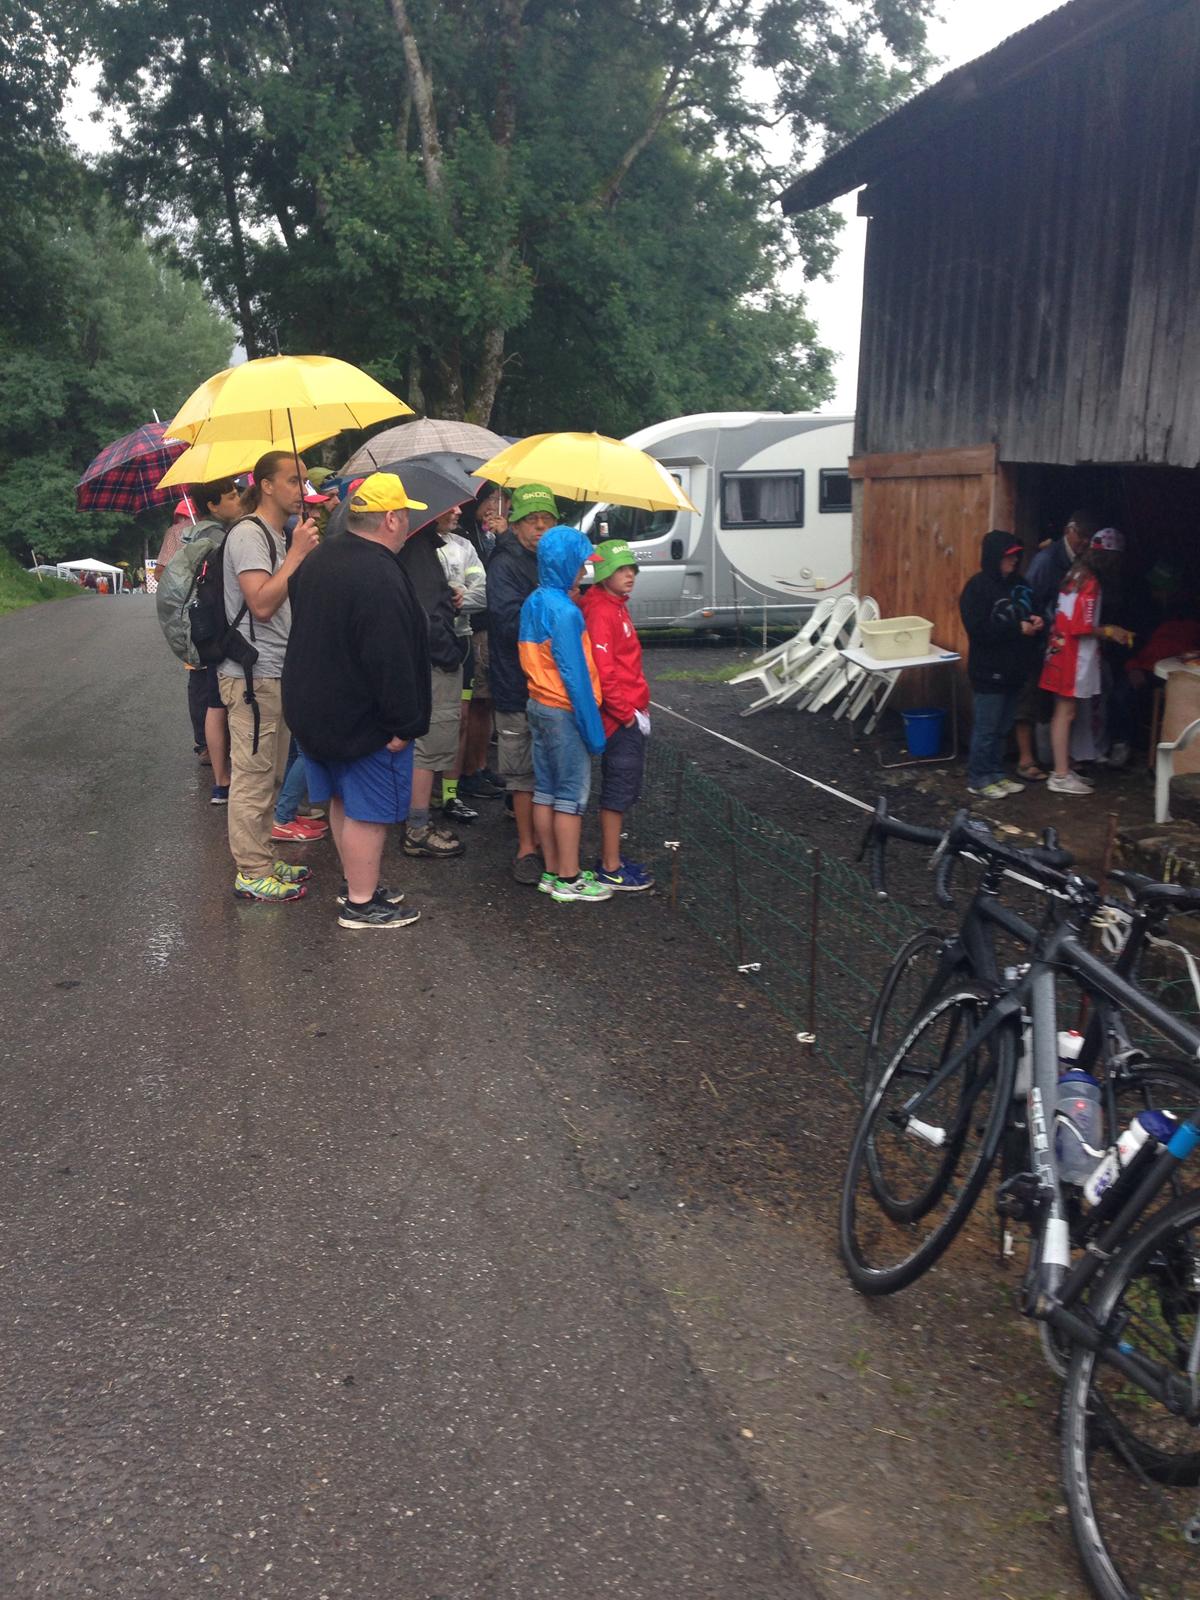 Umbrella group watching the Tour on television. Photo by Enrique Arce-Larreta